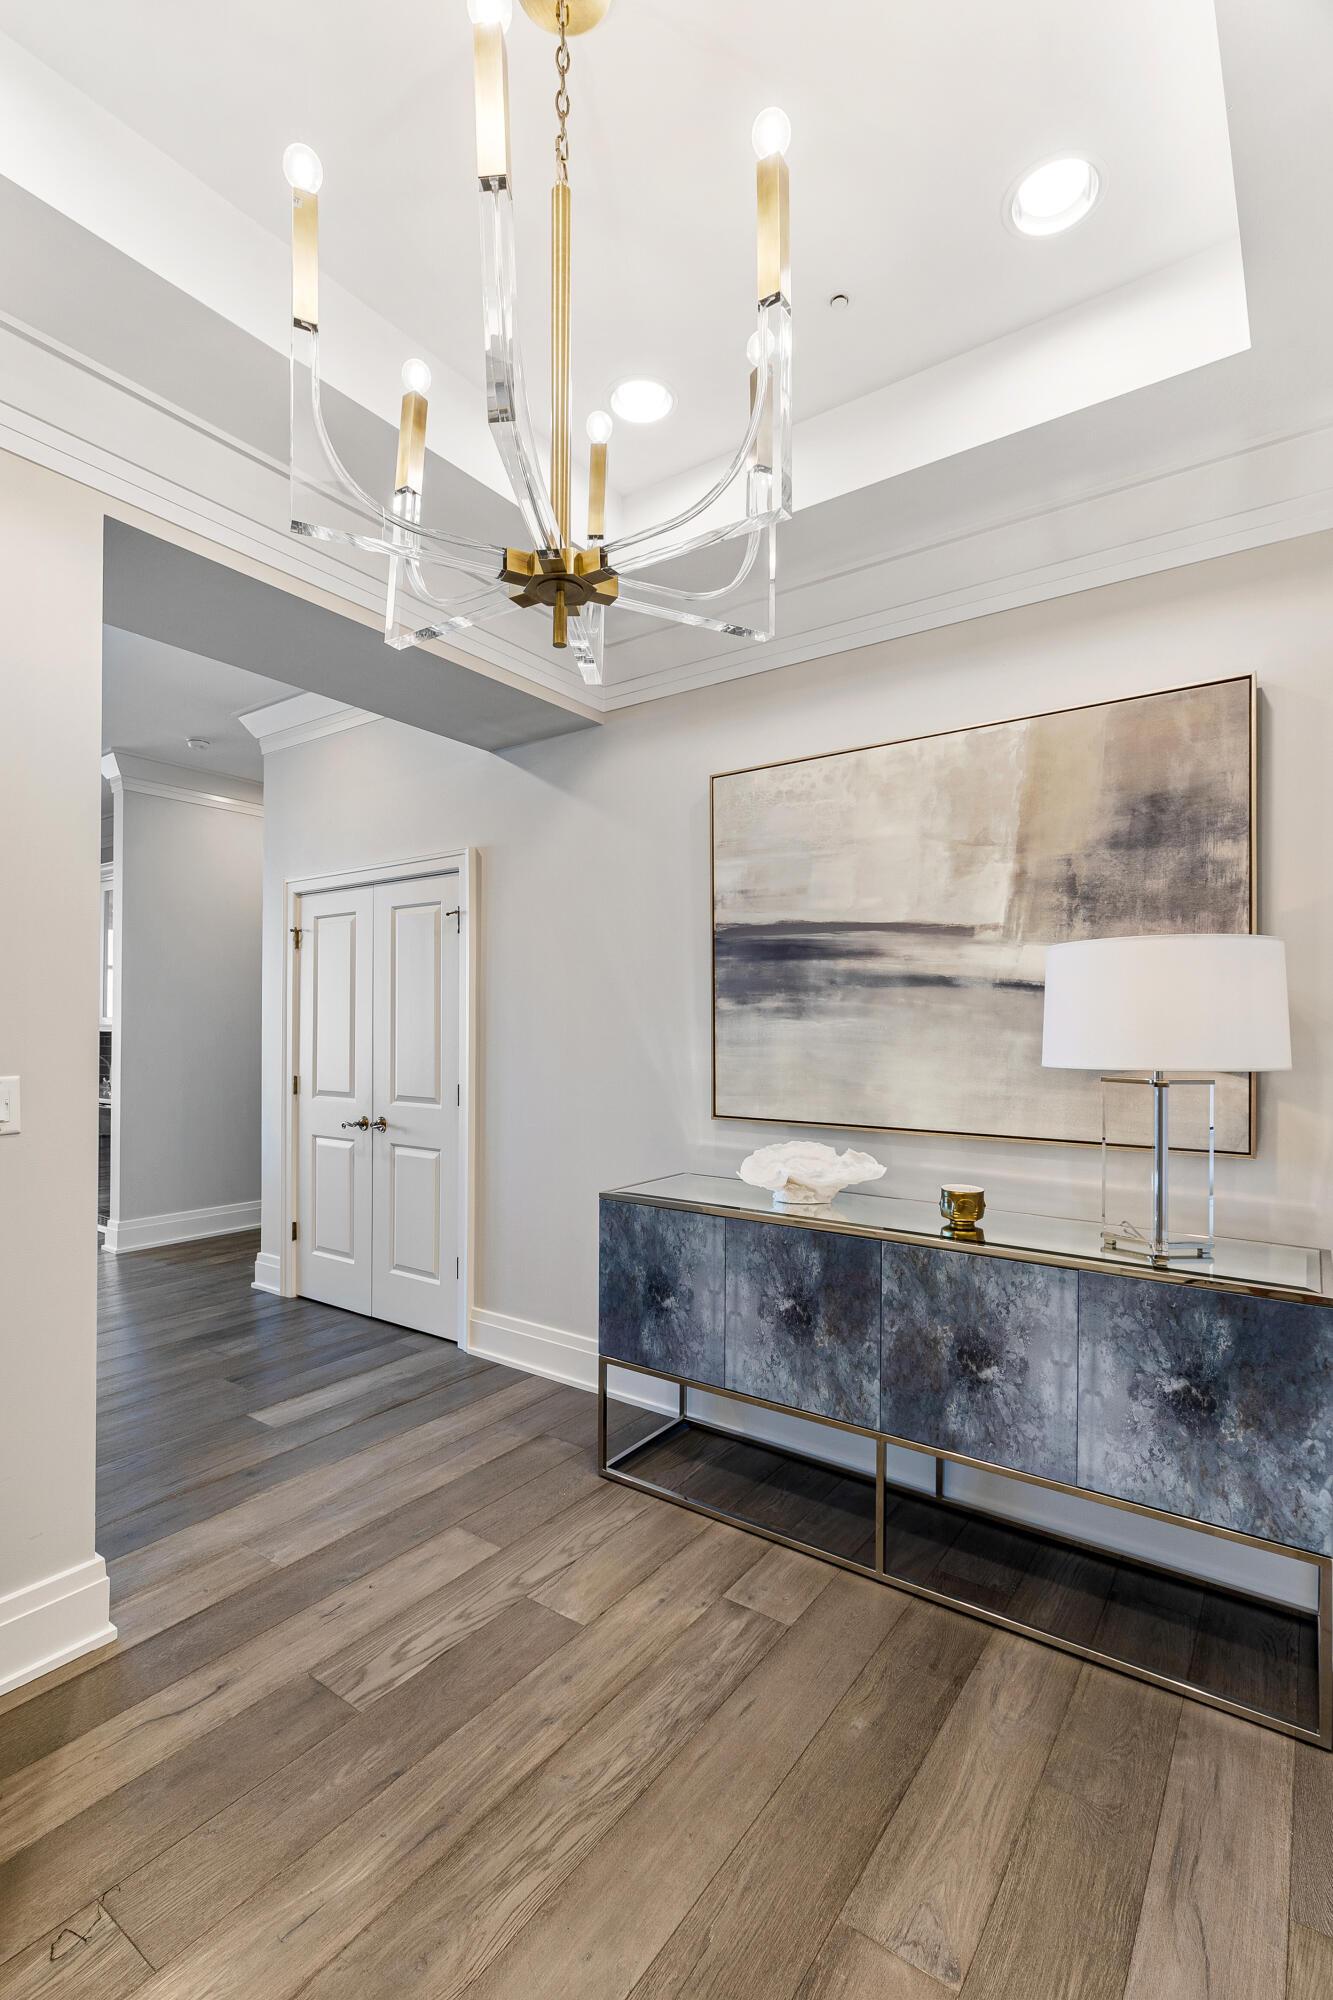 Tides Condominiums Homes For Sale - 367 Cooper River, Mount Pleasant, SC - 33